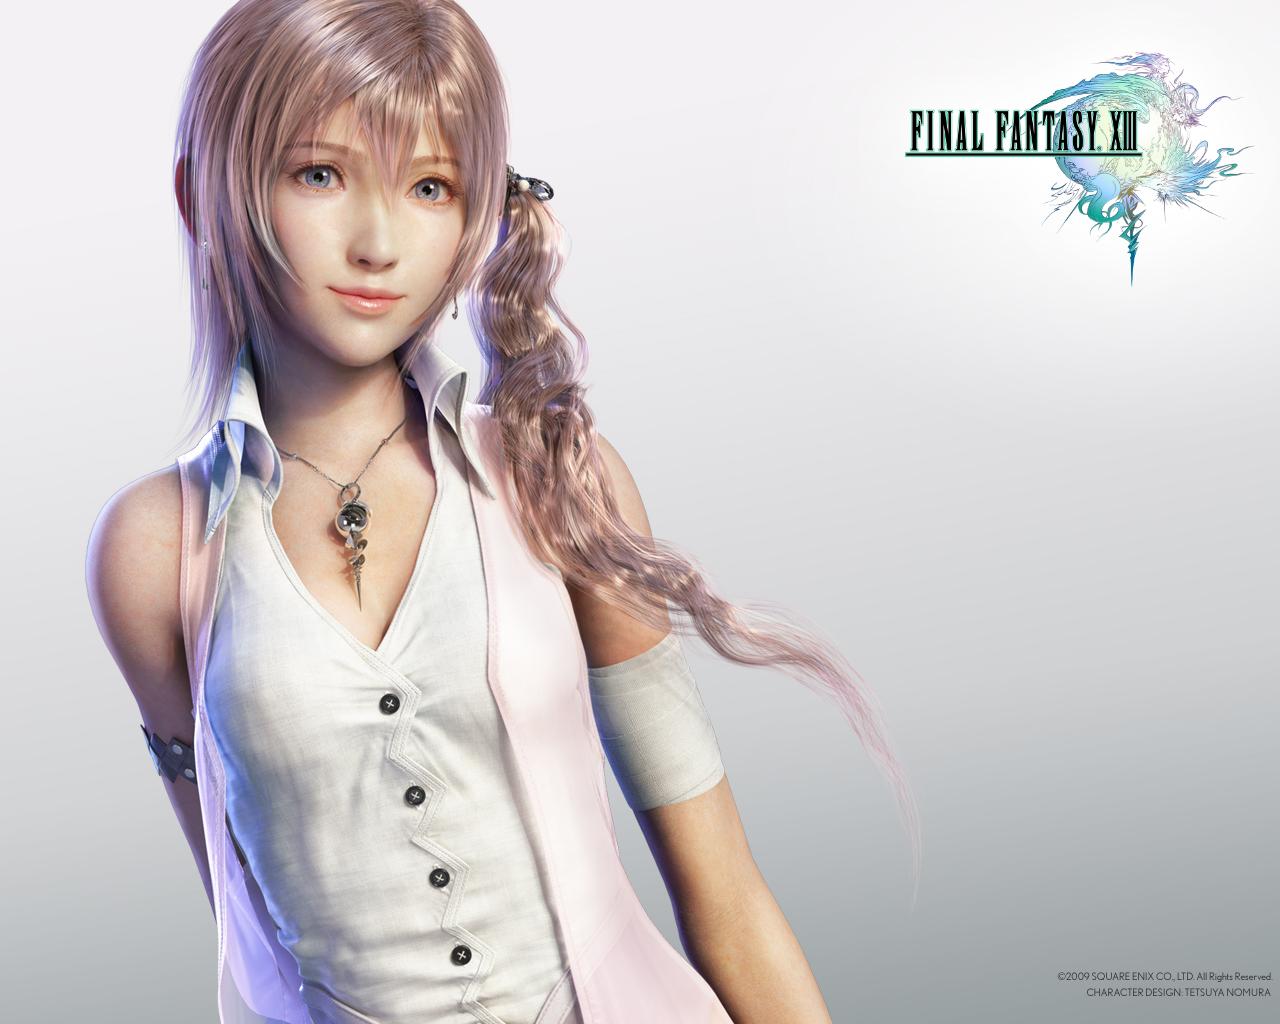 Final Fantasy XIII Wallpapers   Final Fantasy FXN Network 1280x1024